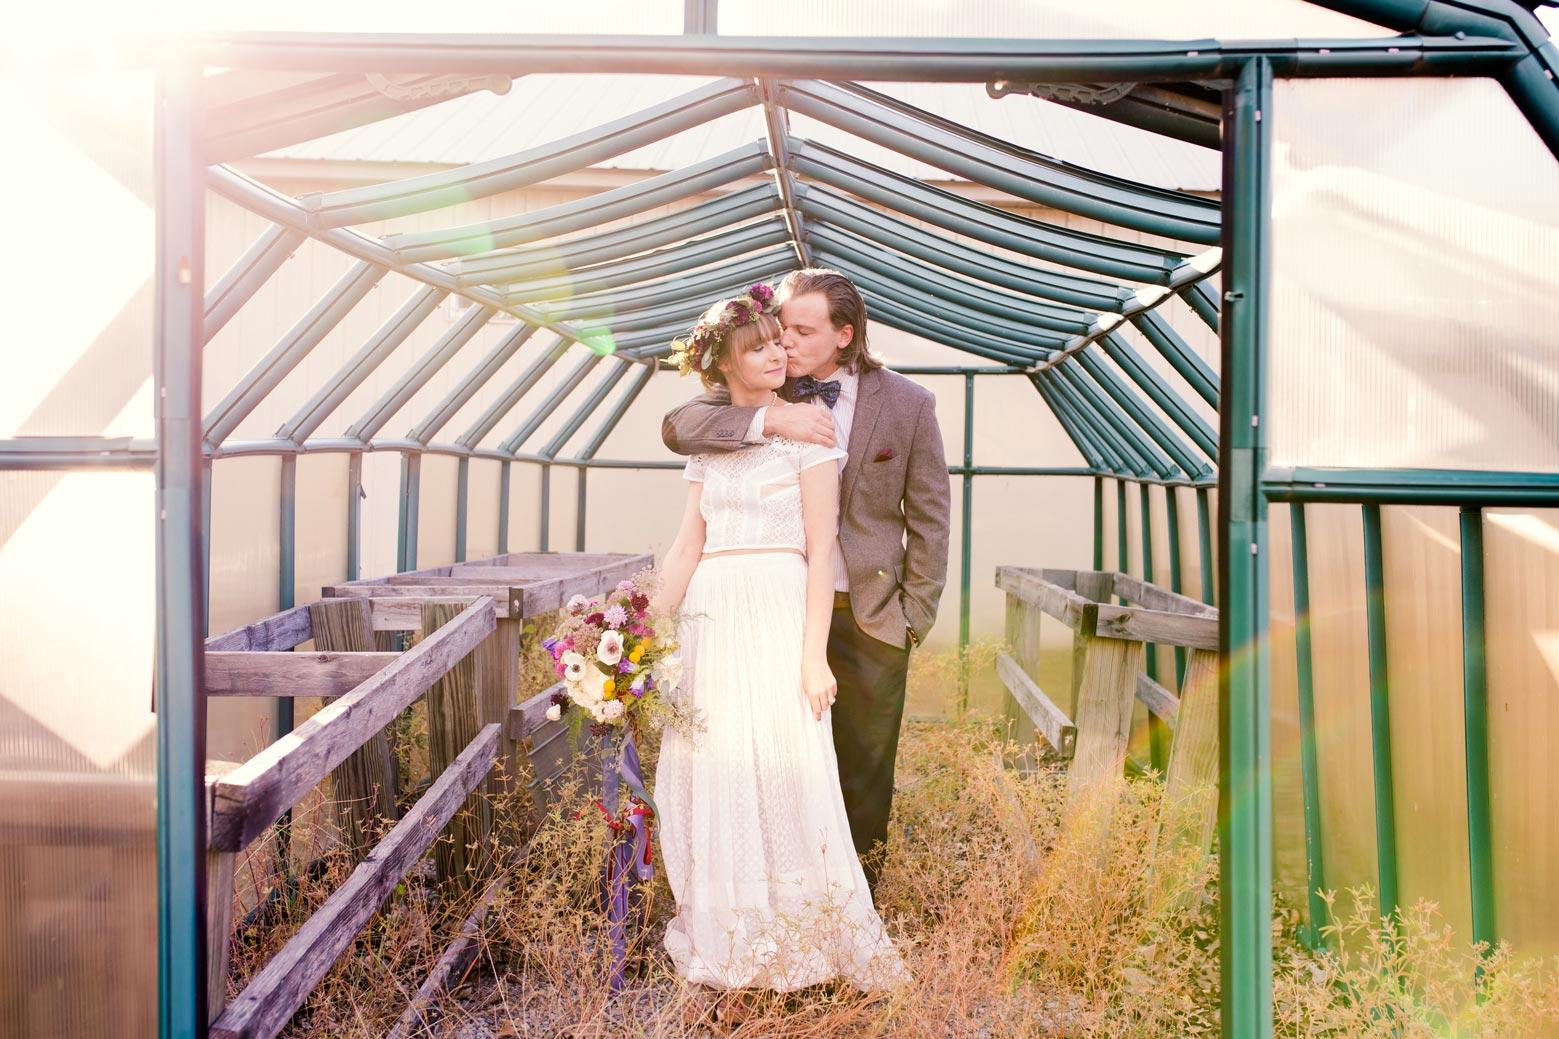 Rustic-Whimsical-Wedding- Tulsa-Wedding-FloristRobyns-Flower-Garden_Mallory-Hall-Photography13.jpg